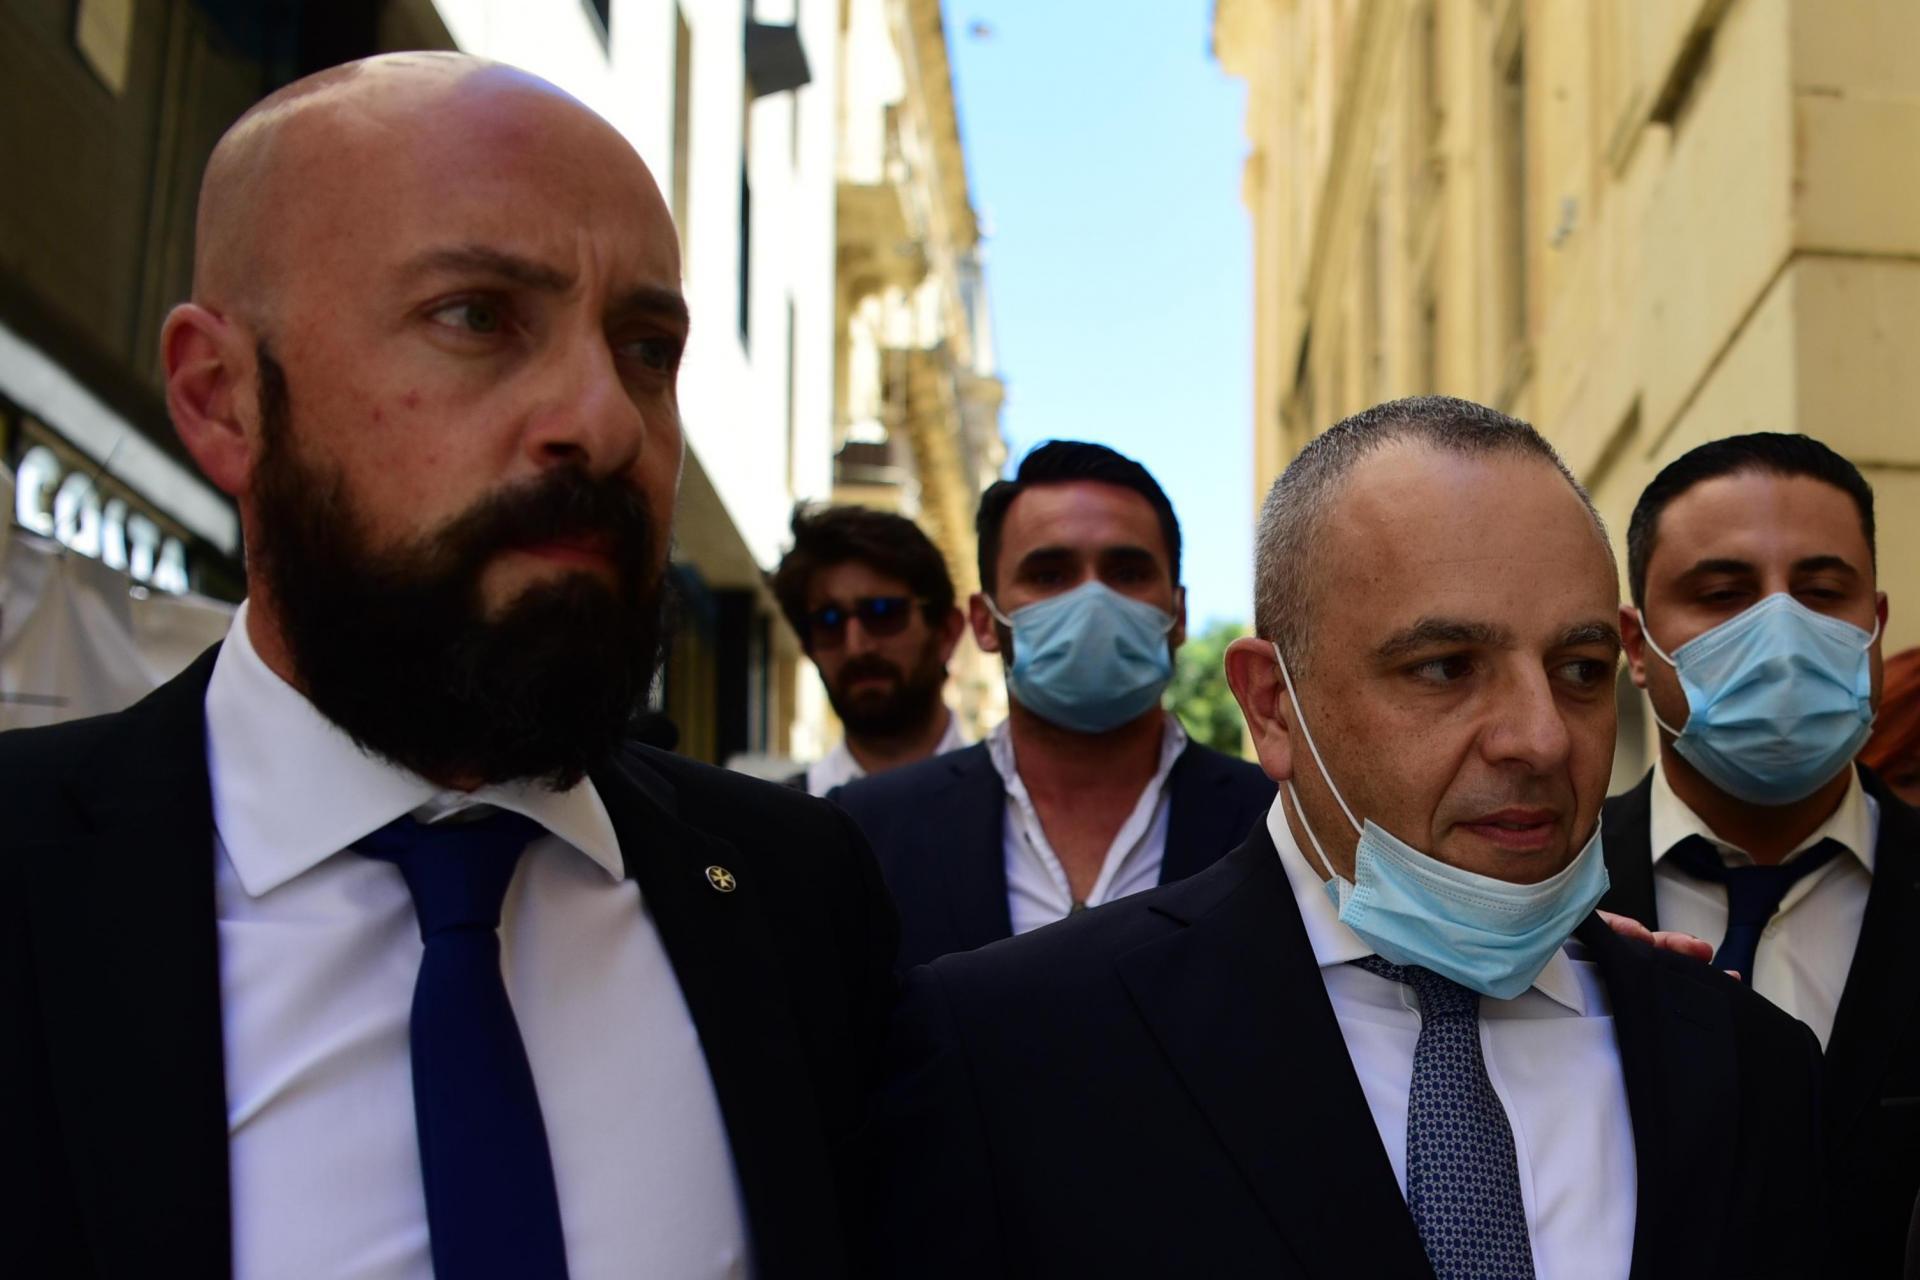 Neville Gafà accompanies Keith Schembri out of court last June. Photo: Mark Zammit Cordina